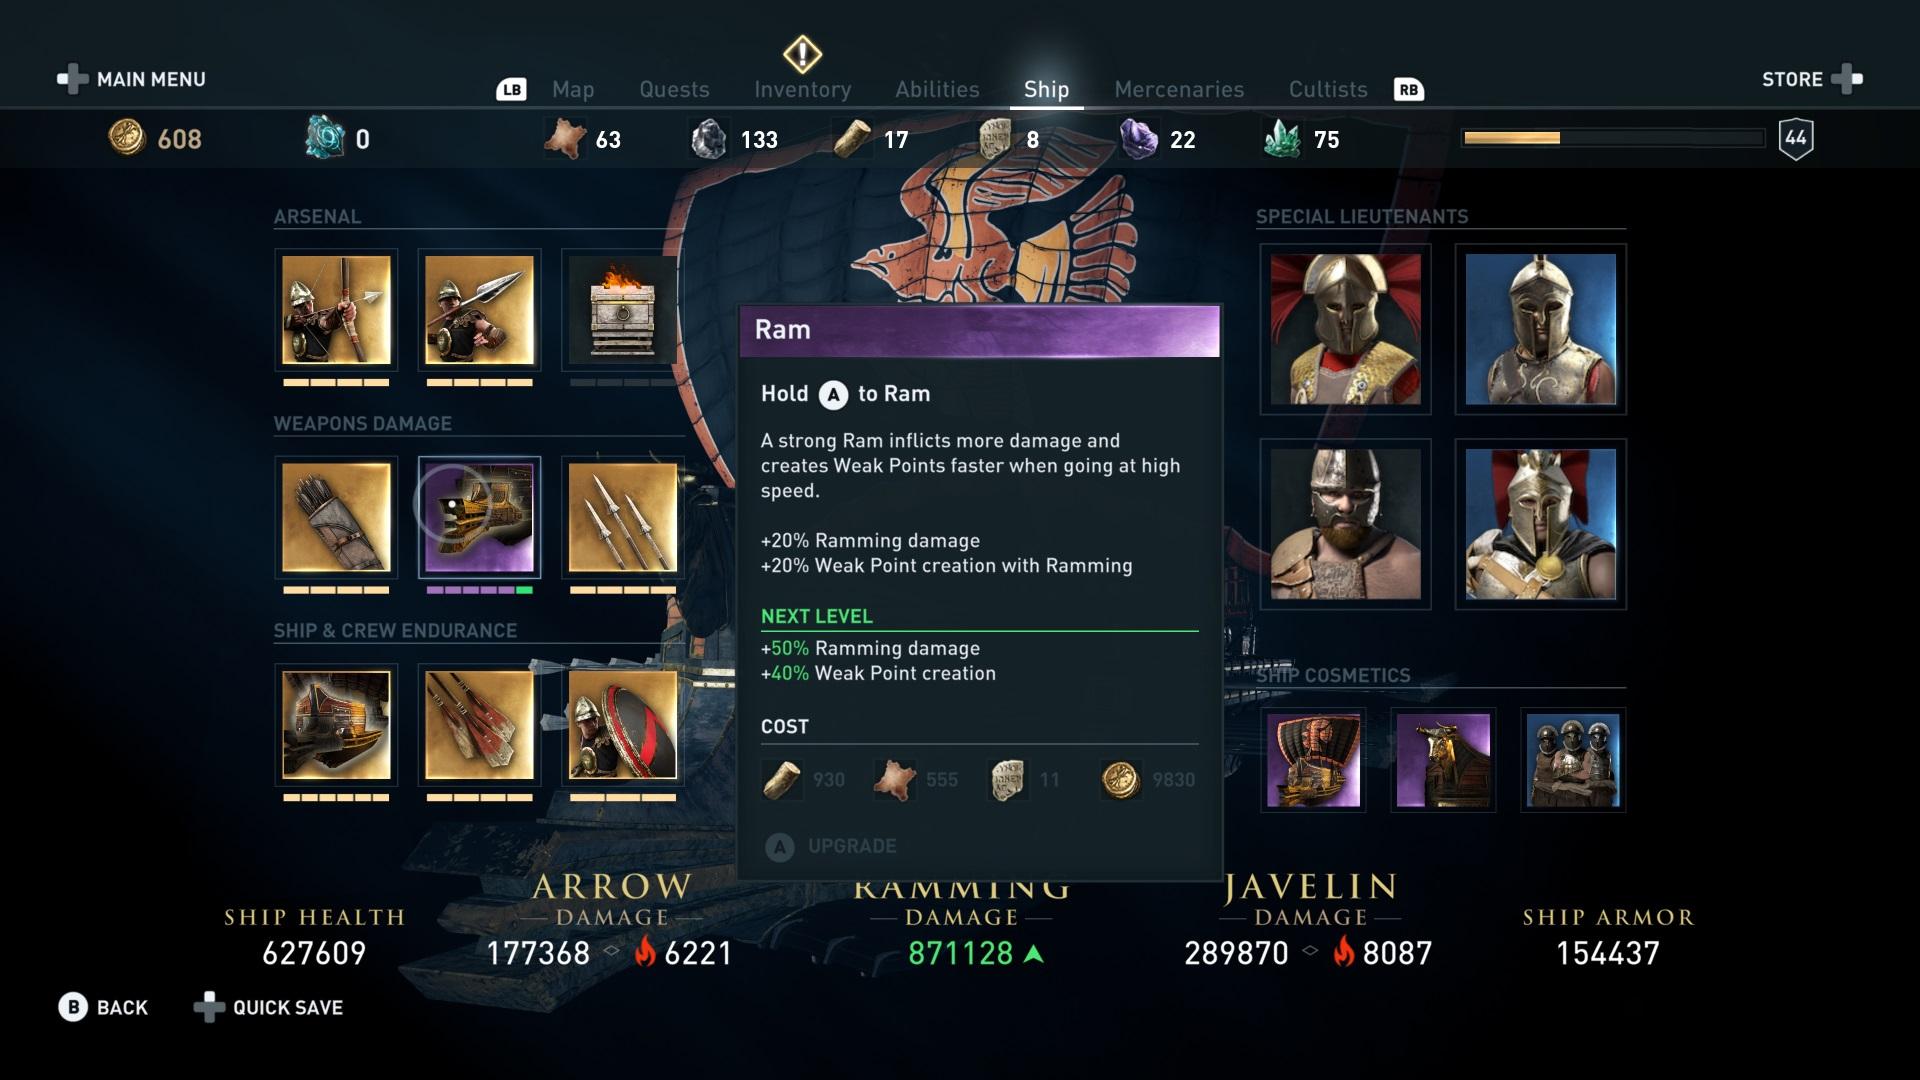 tmcfjr63.jpg - Assassin's Creed: Odyssey